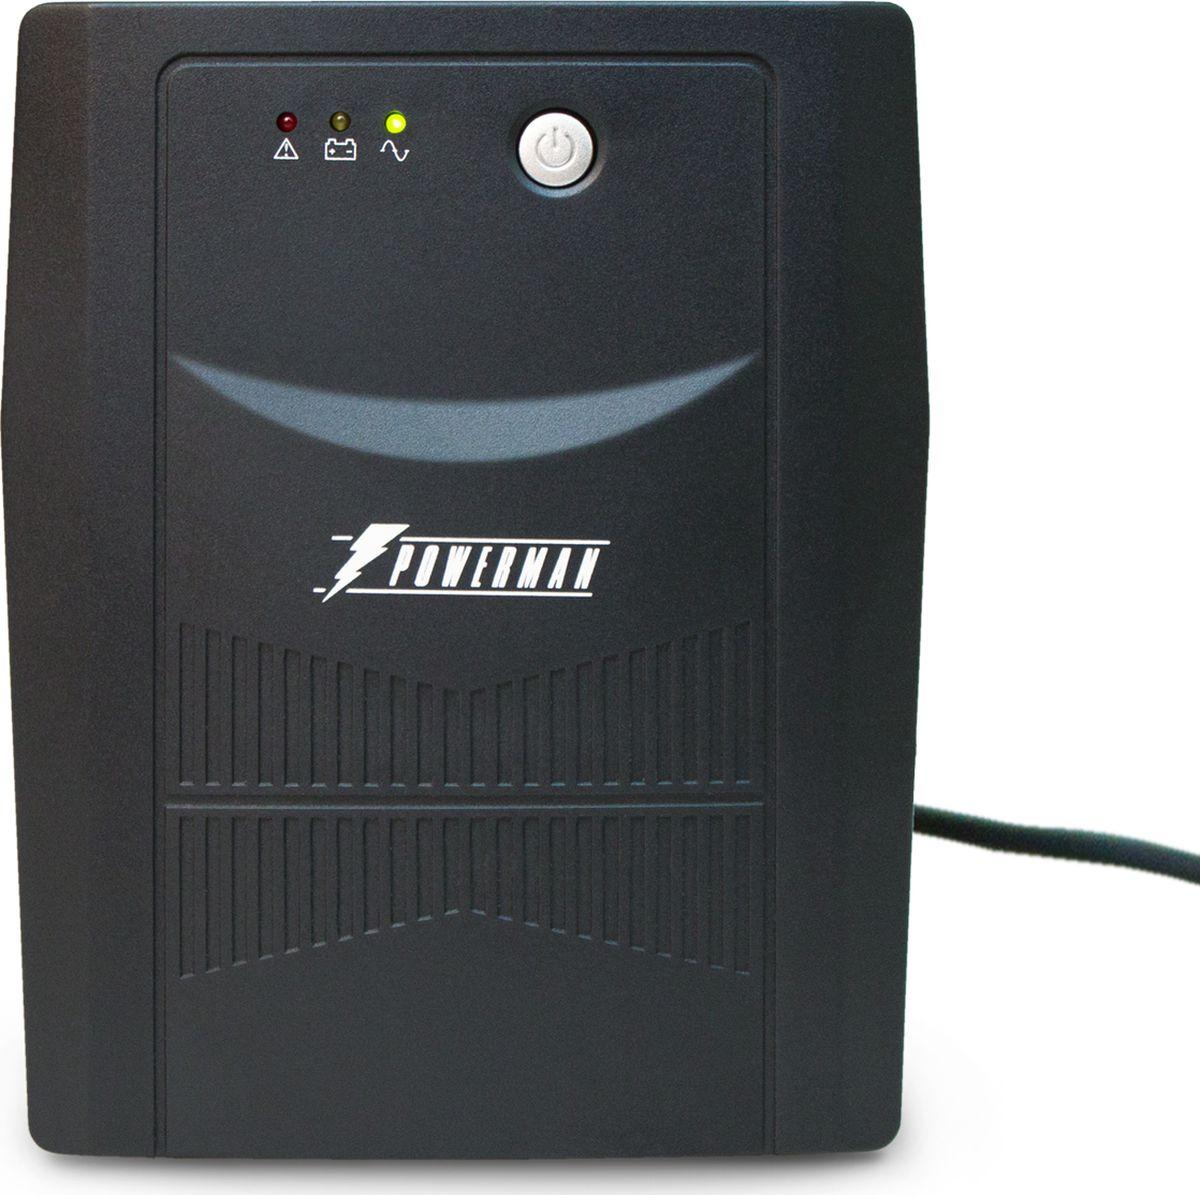 Zakazat.ru Источник бесперебойного питания Powerman UPS Ваck Pro 2000 Plus, 2000 ВА